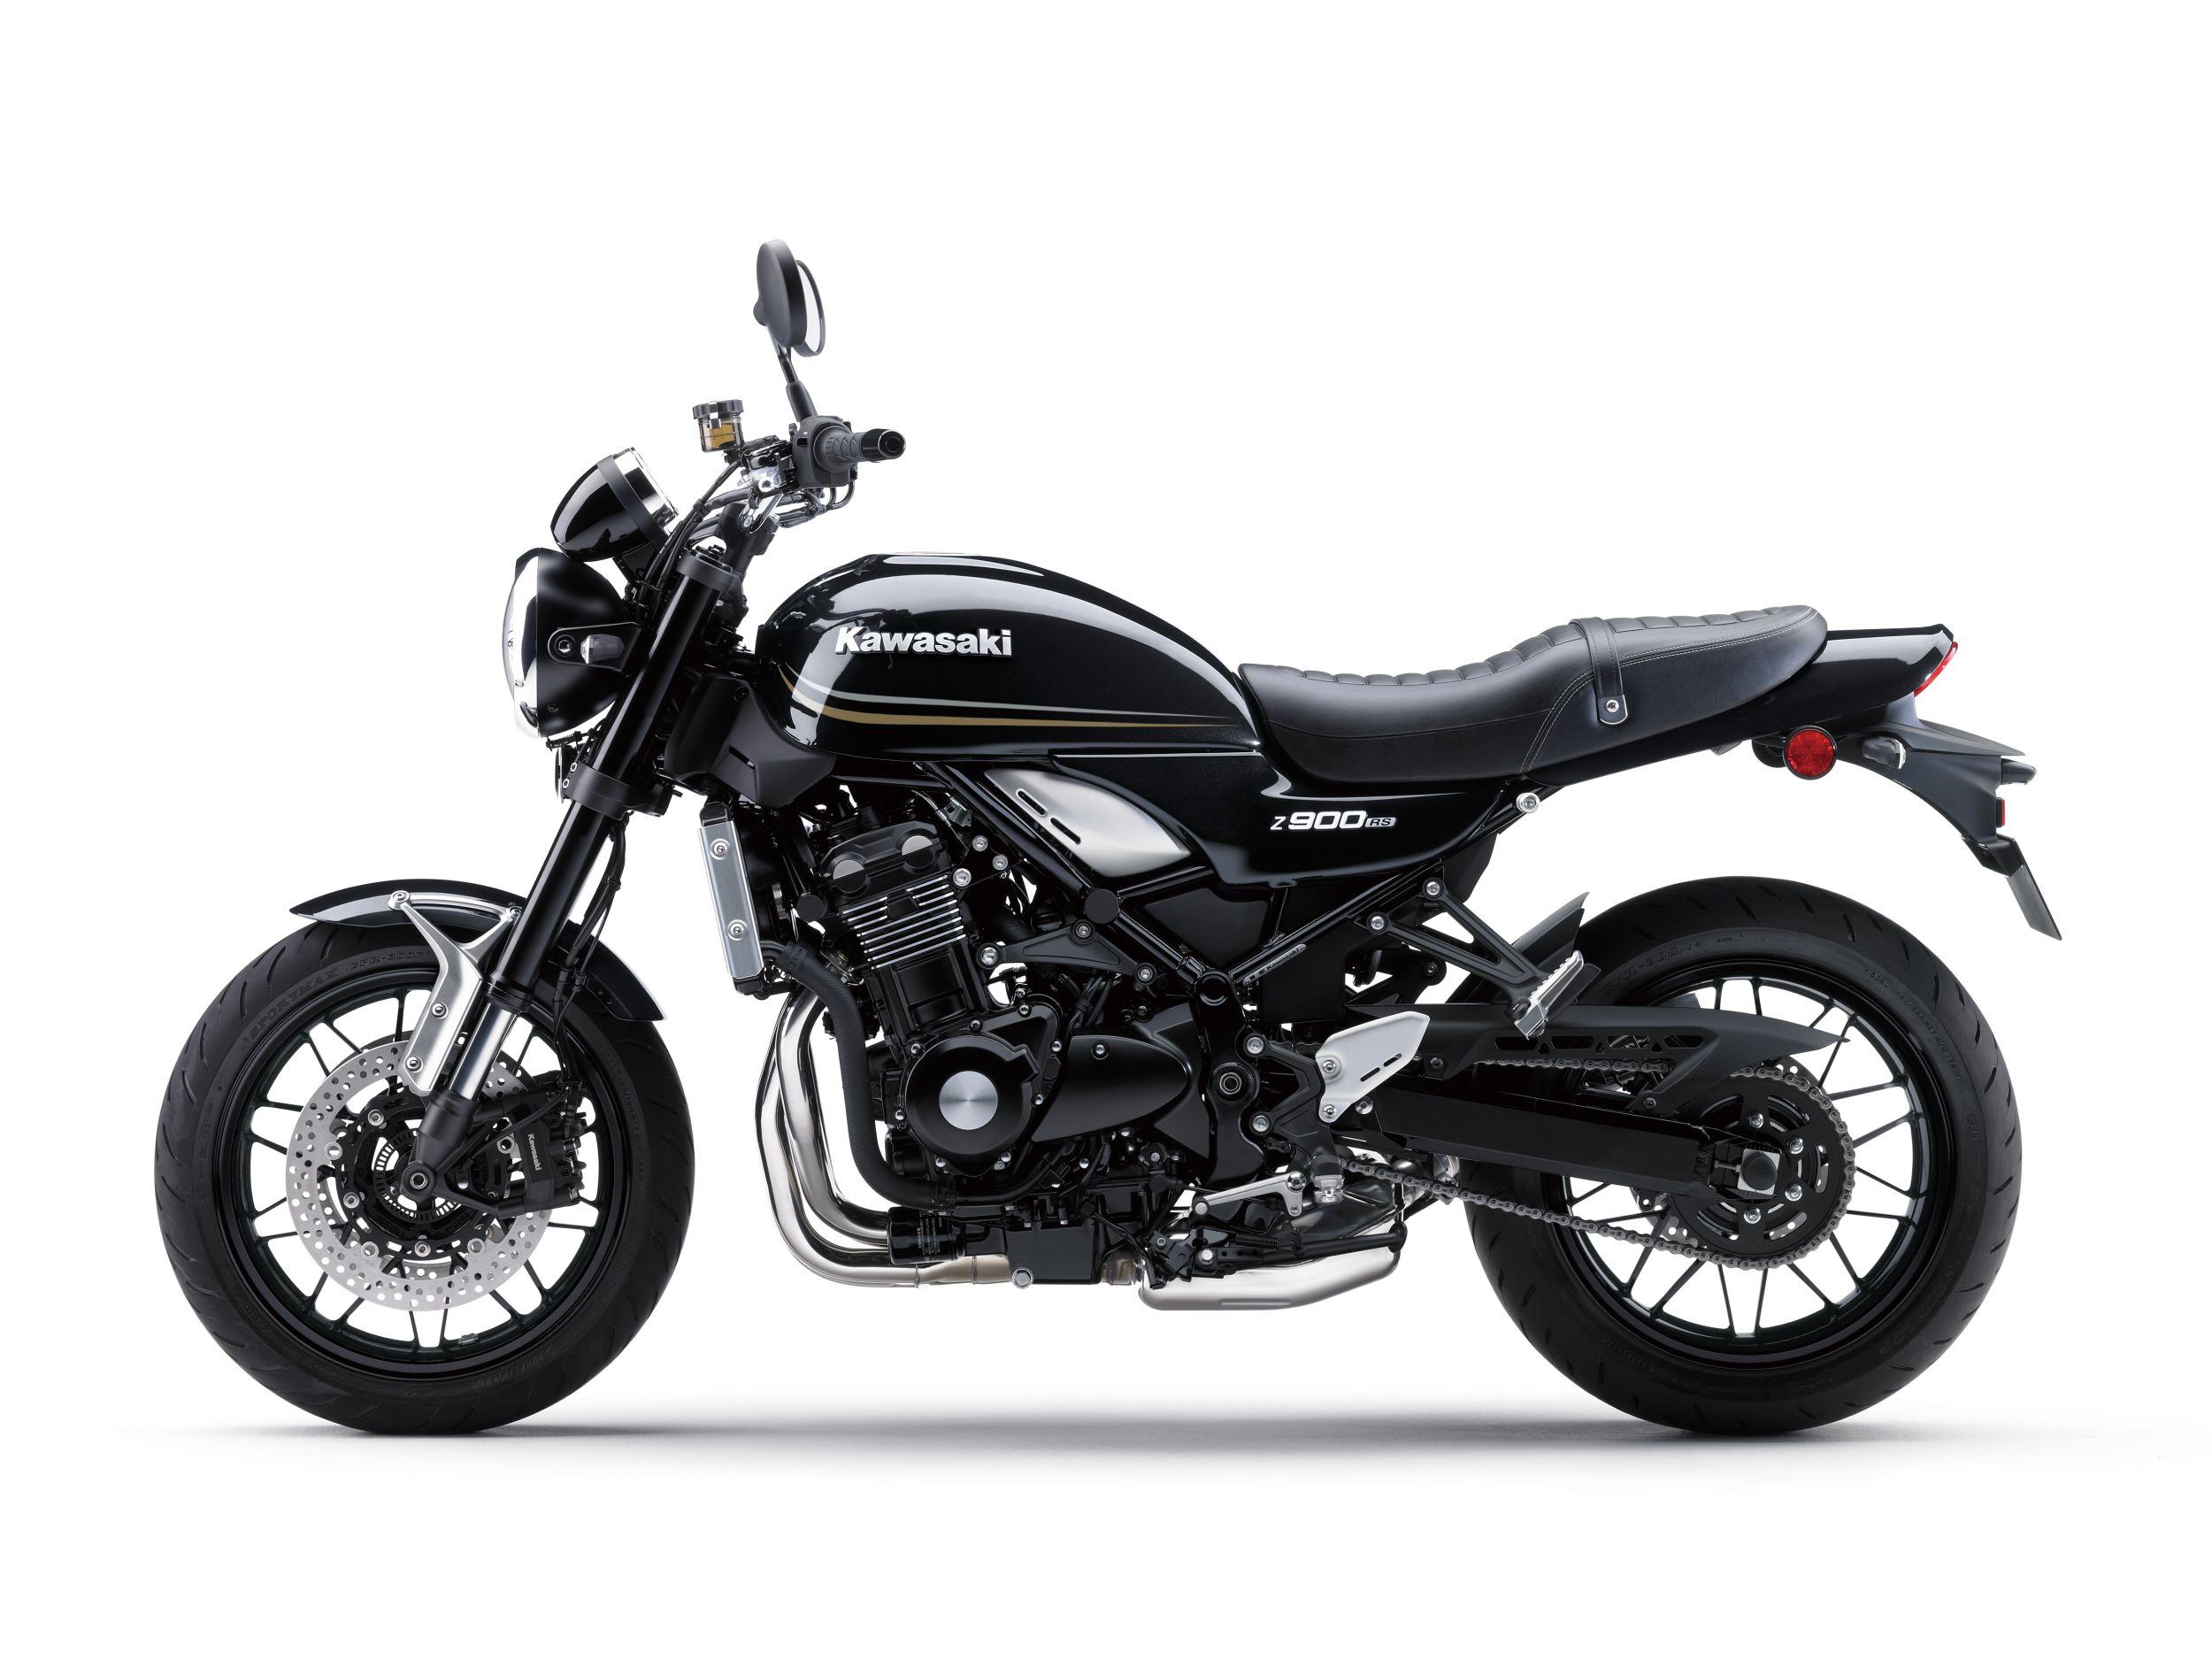 motorrad occasion kawasaki z900rs kaufen